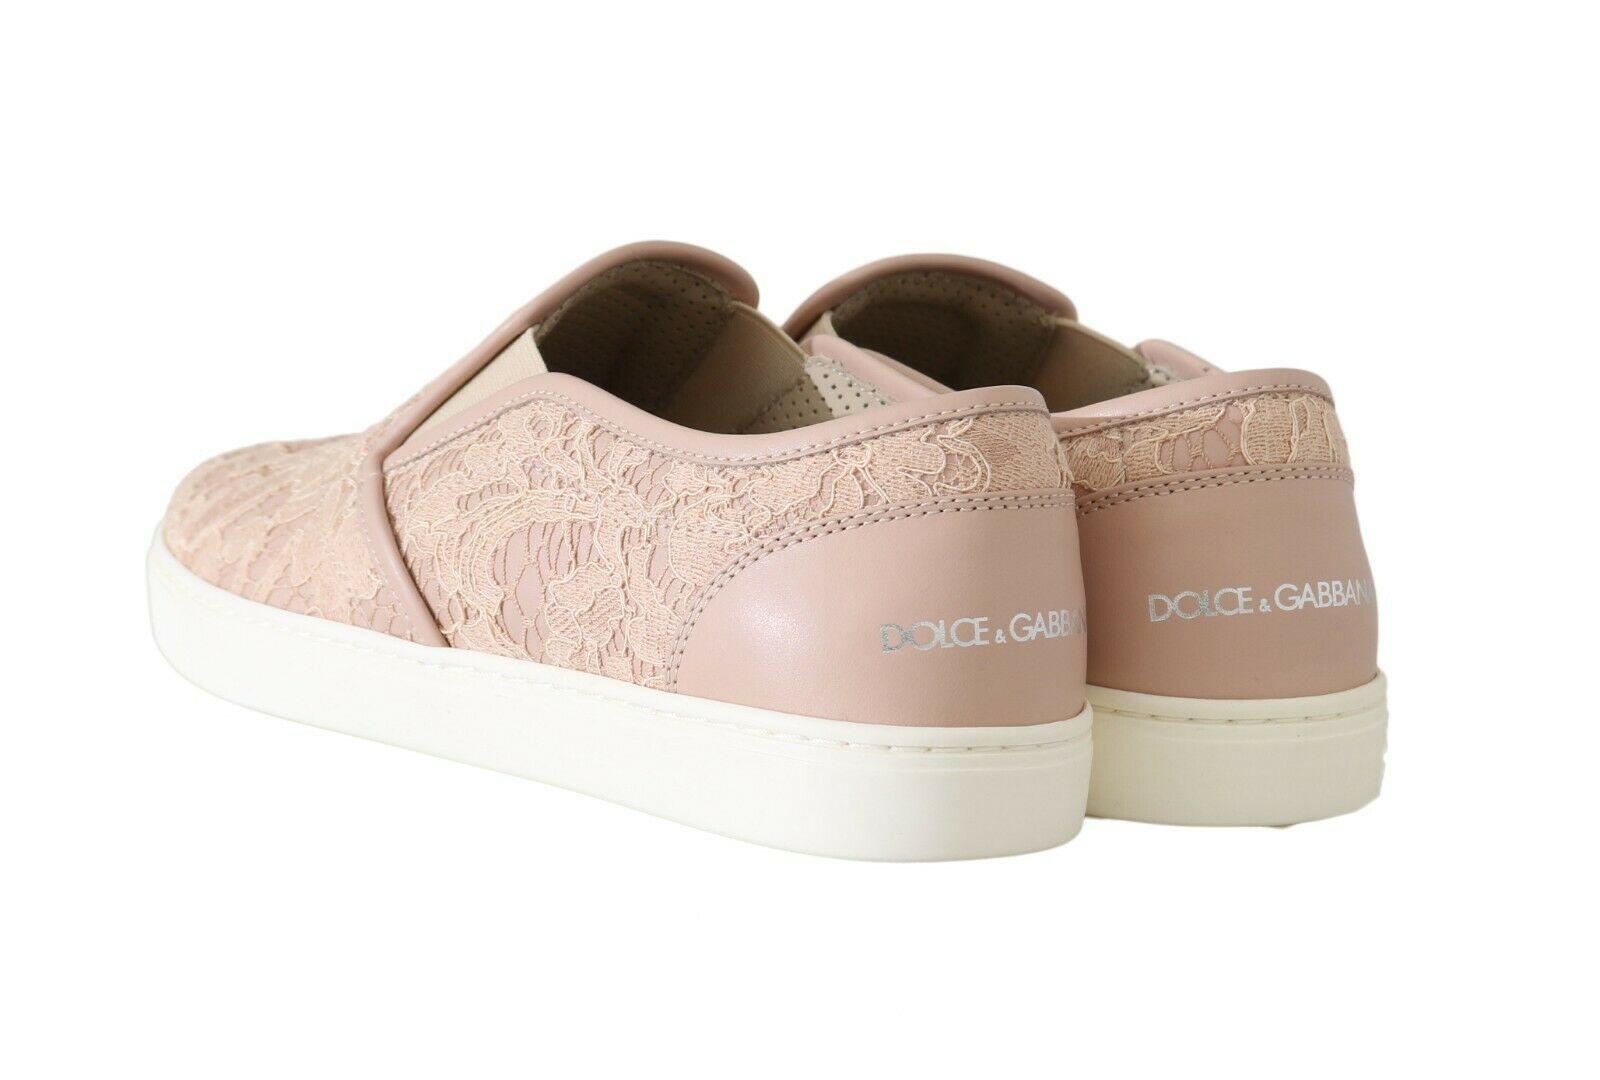 Dolce & Gabbana Women's Leather Lace Flat Shoe Pink LA5683 - EU40/US9.5